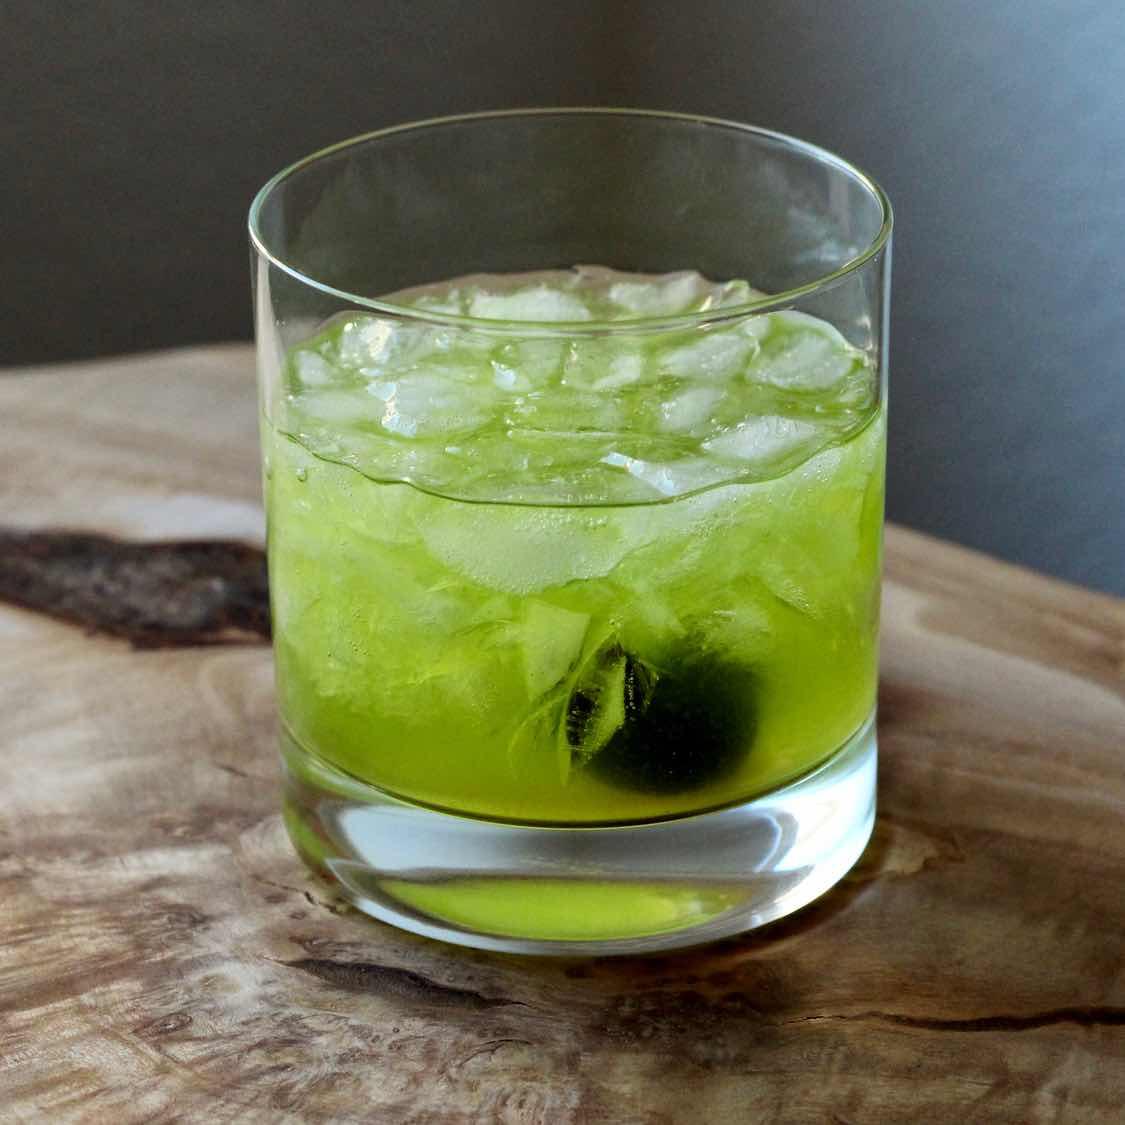 Improved Midori Sour - A Balanced Herbal Twist on the Midori Sour